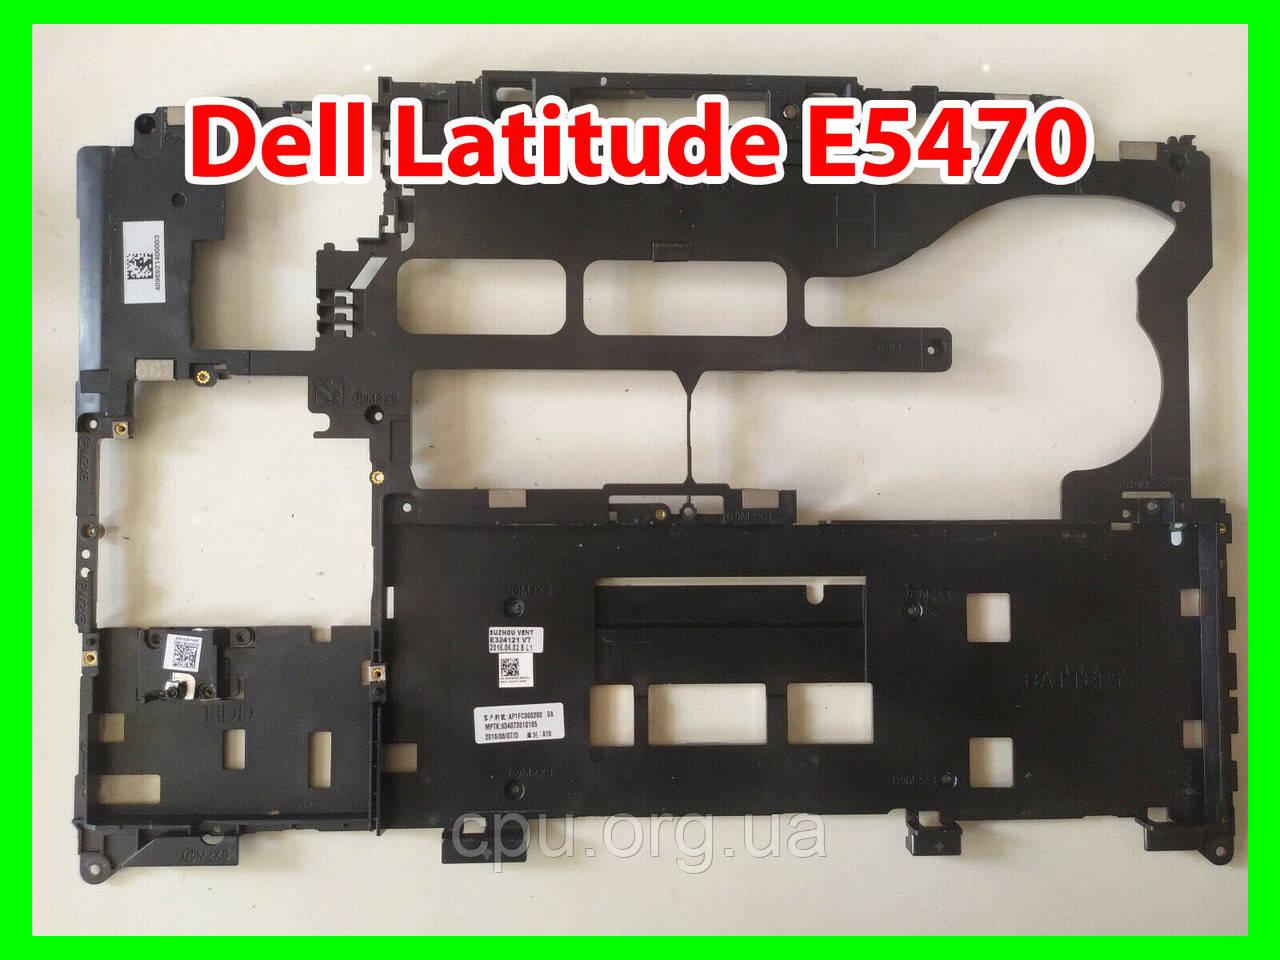 Dell Latitude E5470 средняя часть корпуса case middle case 0KMWXR KMWXR